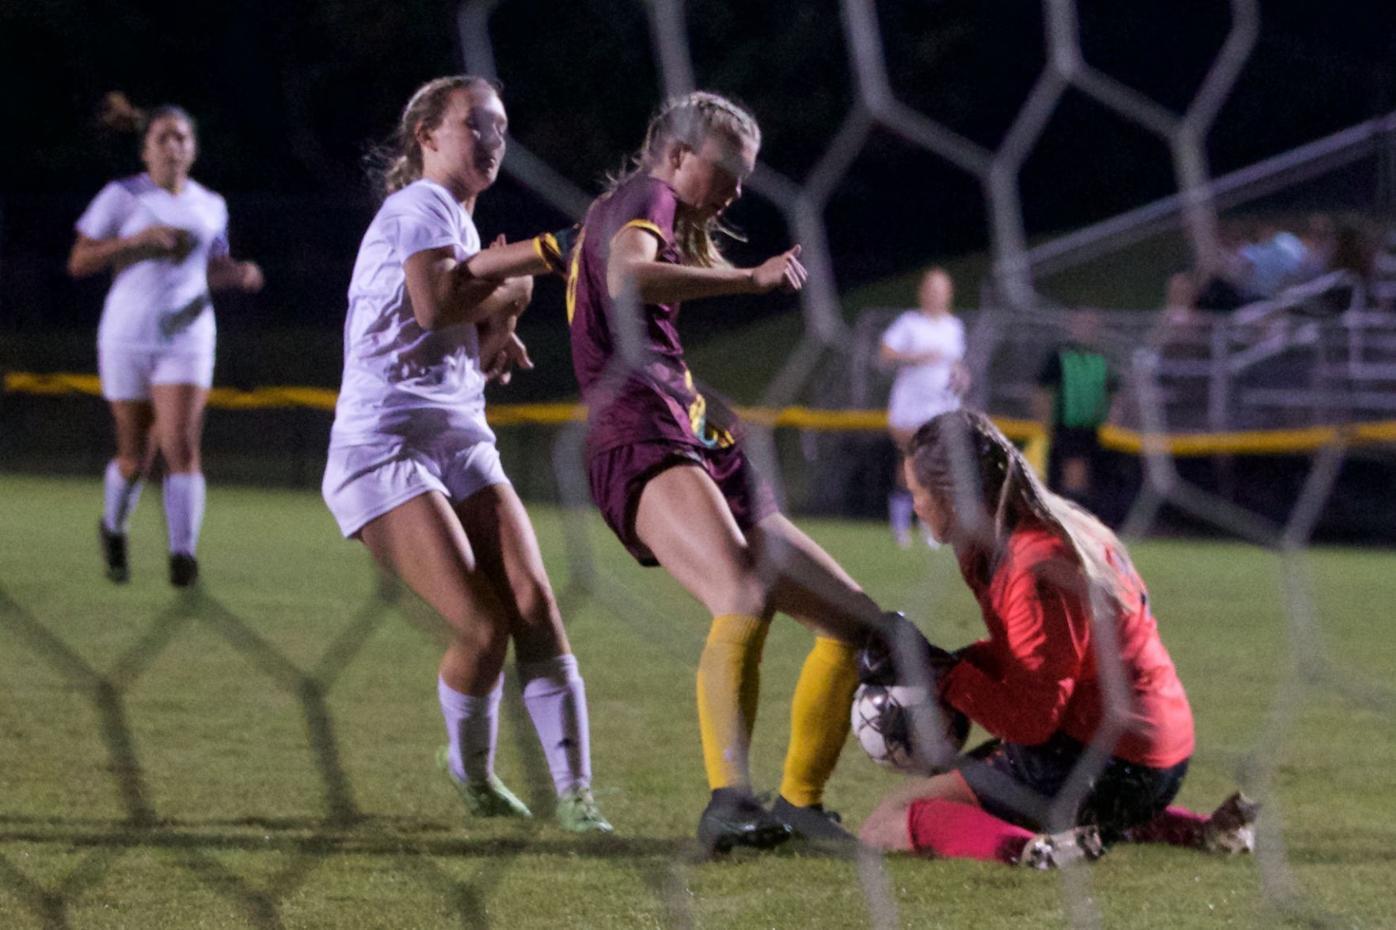 211012-sports-Greenwood vs. Barren Region 4 Girls' Soccer Tournament Semifinals_outbound 1.jpg